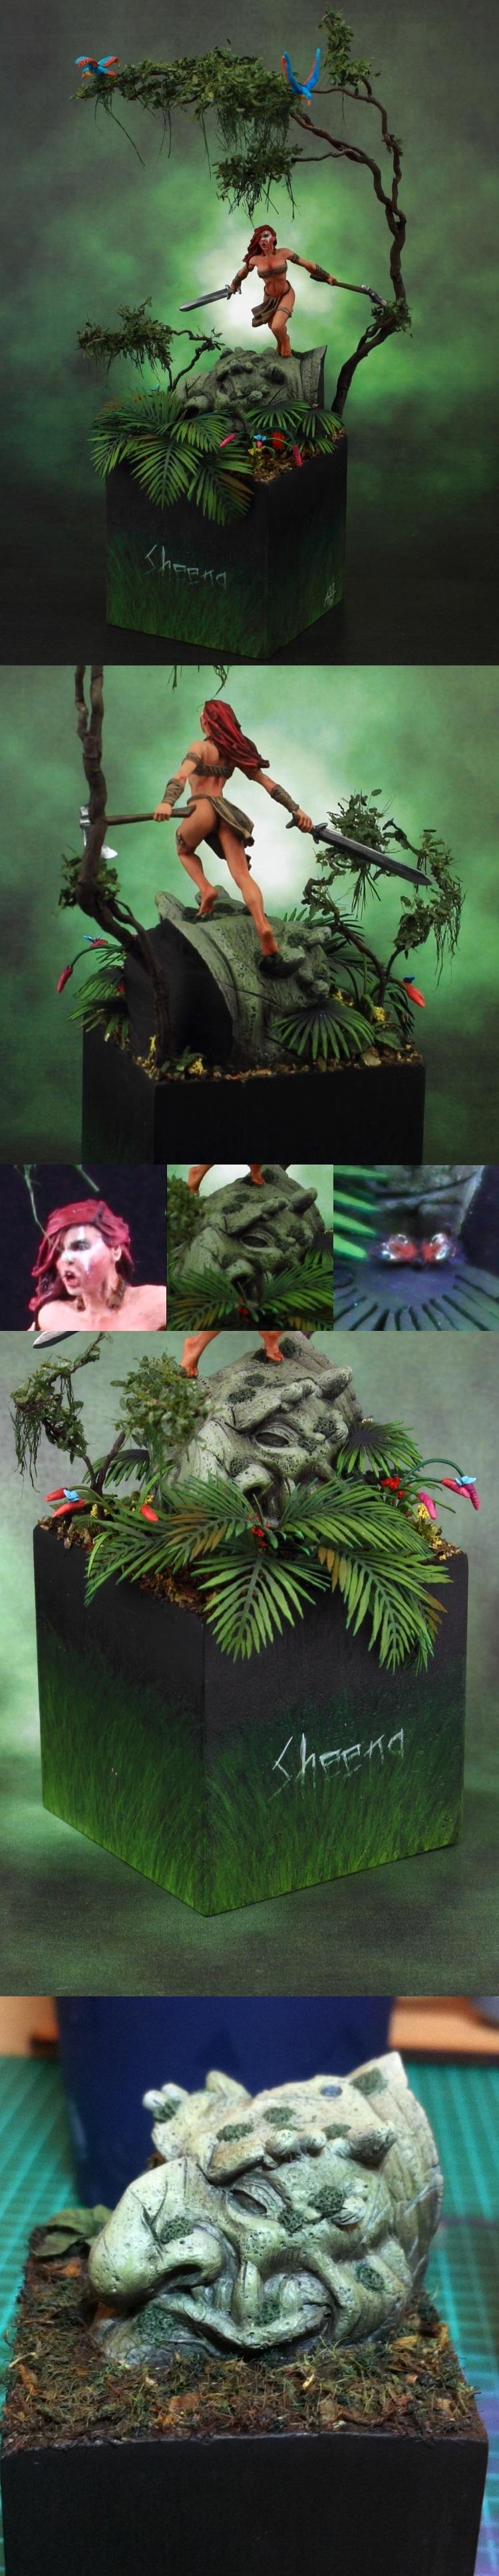 Sheena, The Jungle Princess